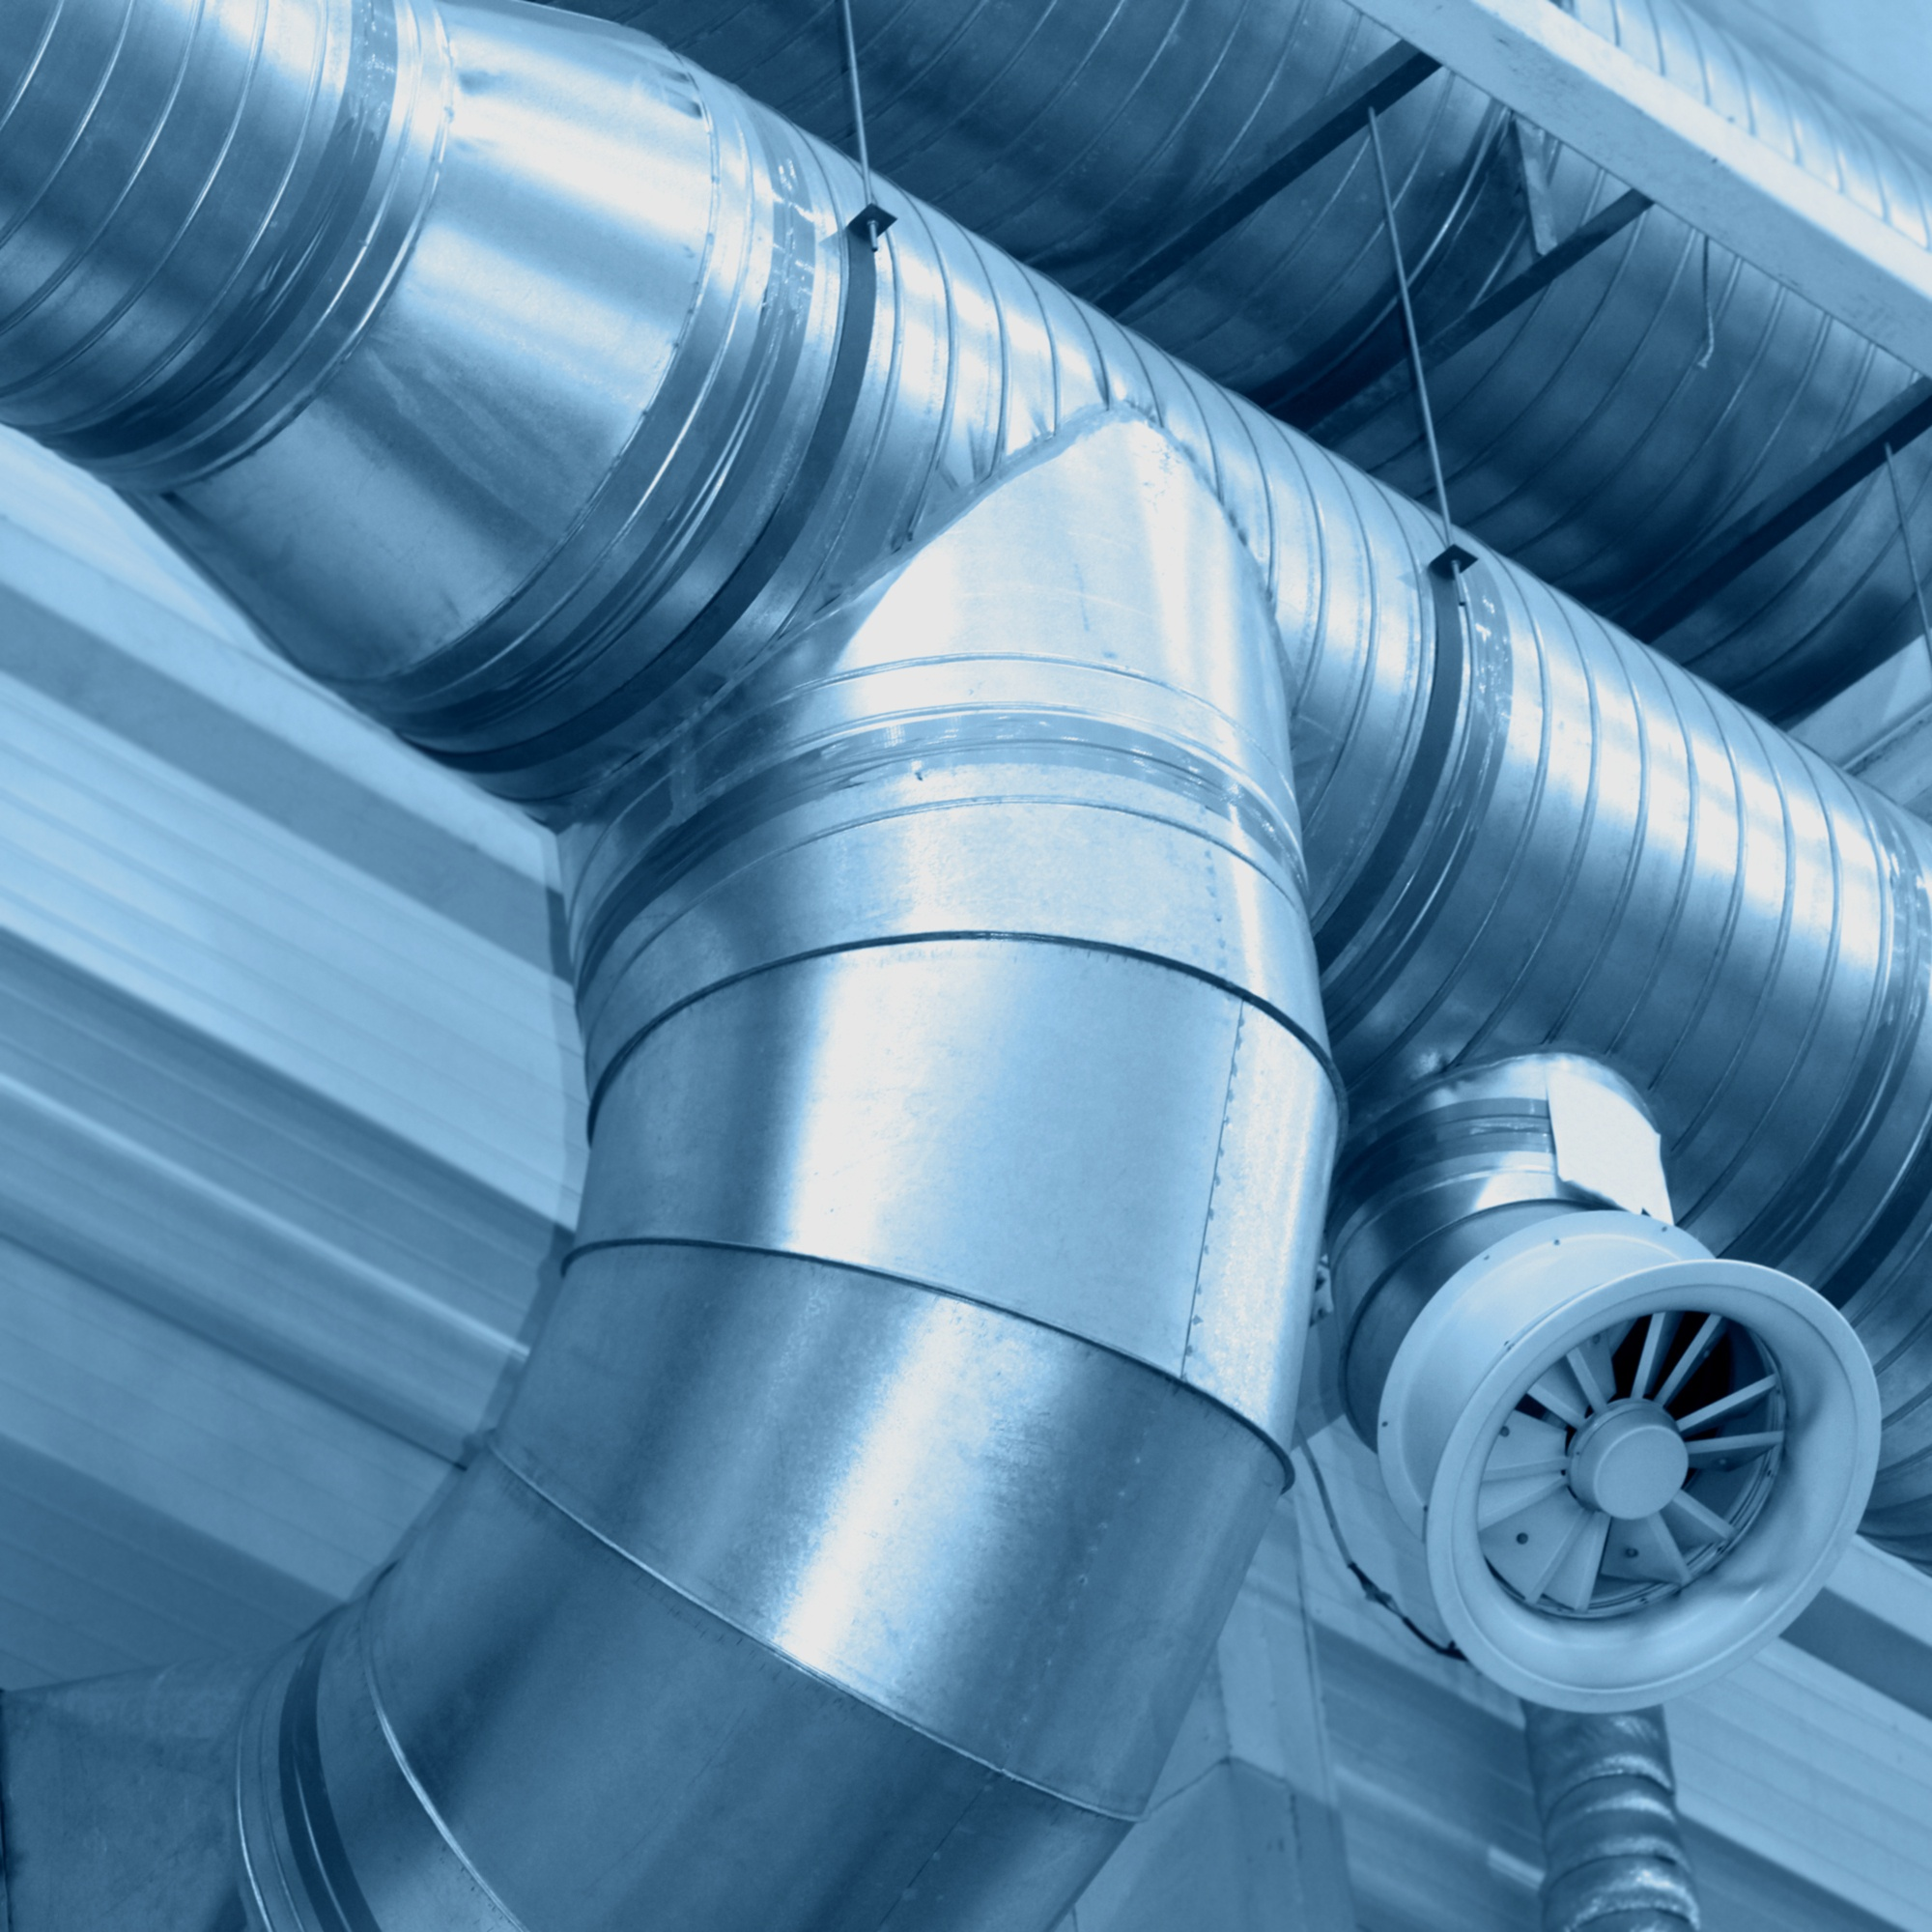 bigstock-System-of-ventilating-pipes-19459328.jpg